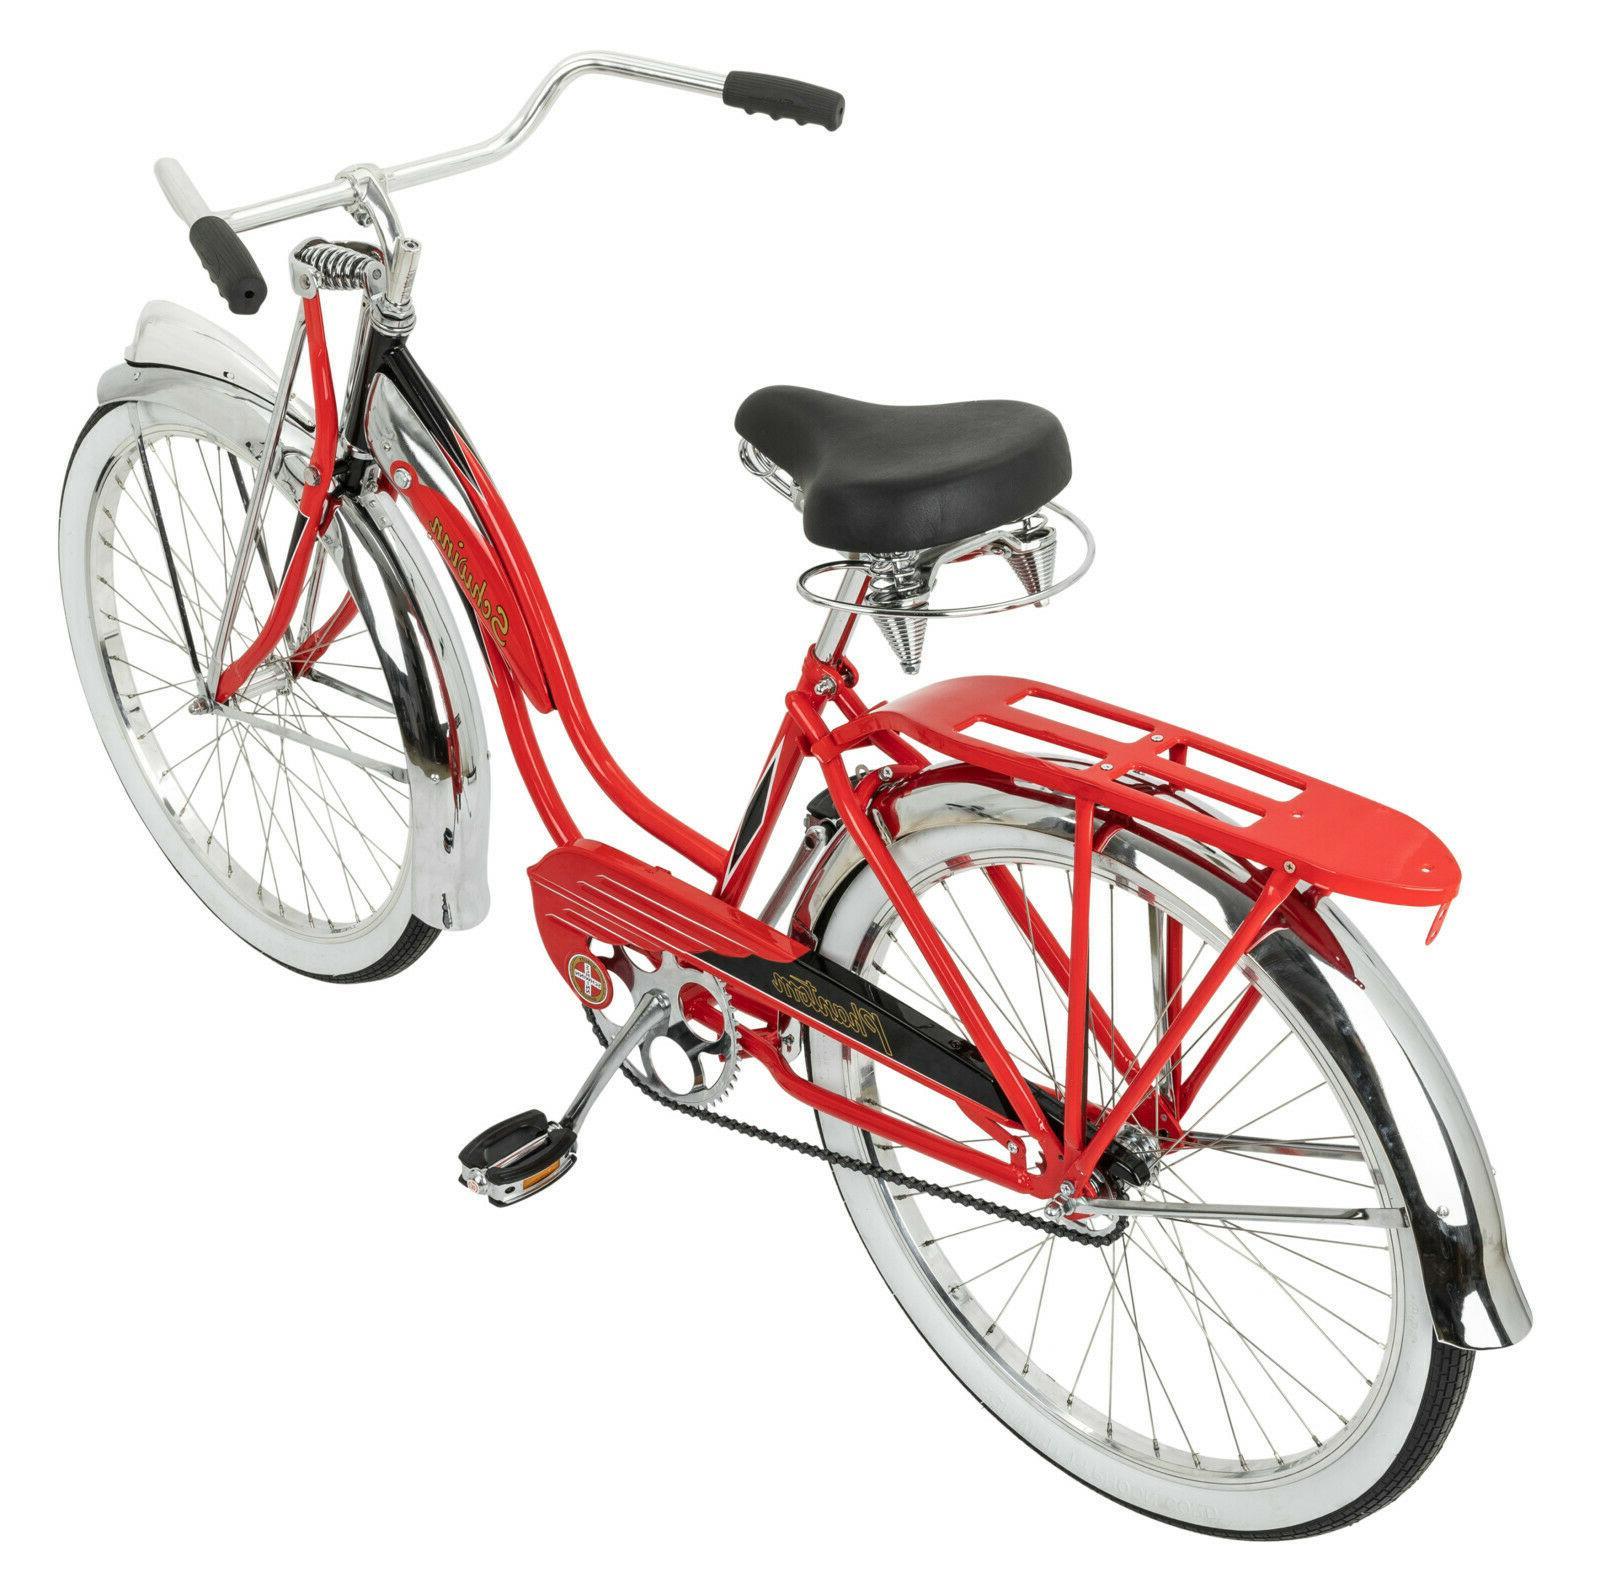 Schwinn Phantom Cruiser Bike, single speed, 26-inch wheels,